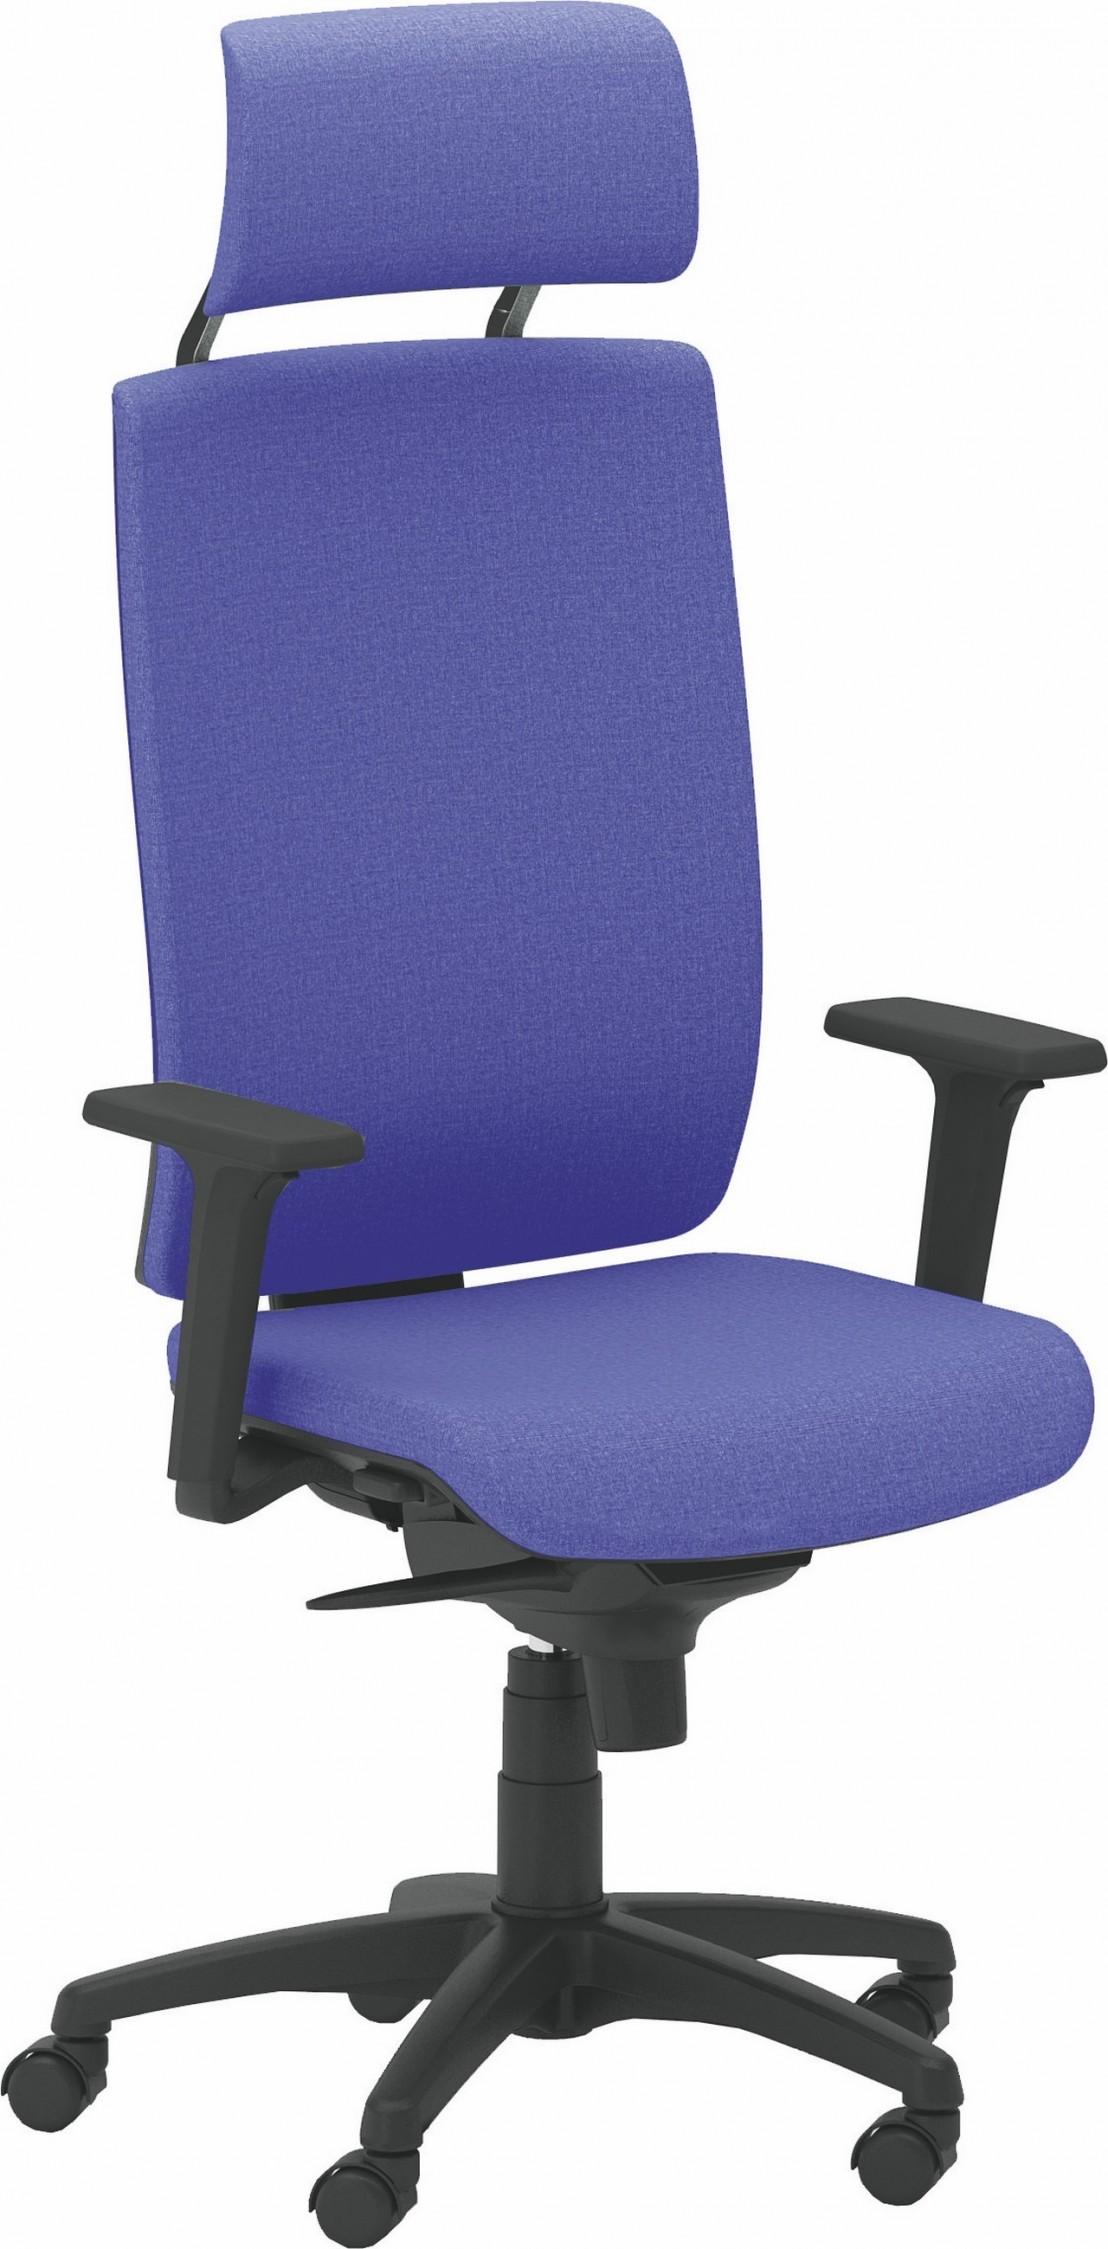 fauteuil de bureau haut maison design. Black Bedroom Furniture Sets. Home Design Ideas